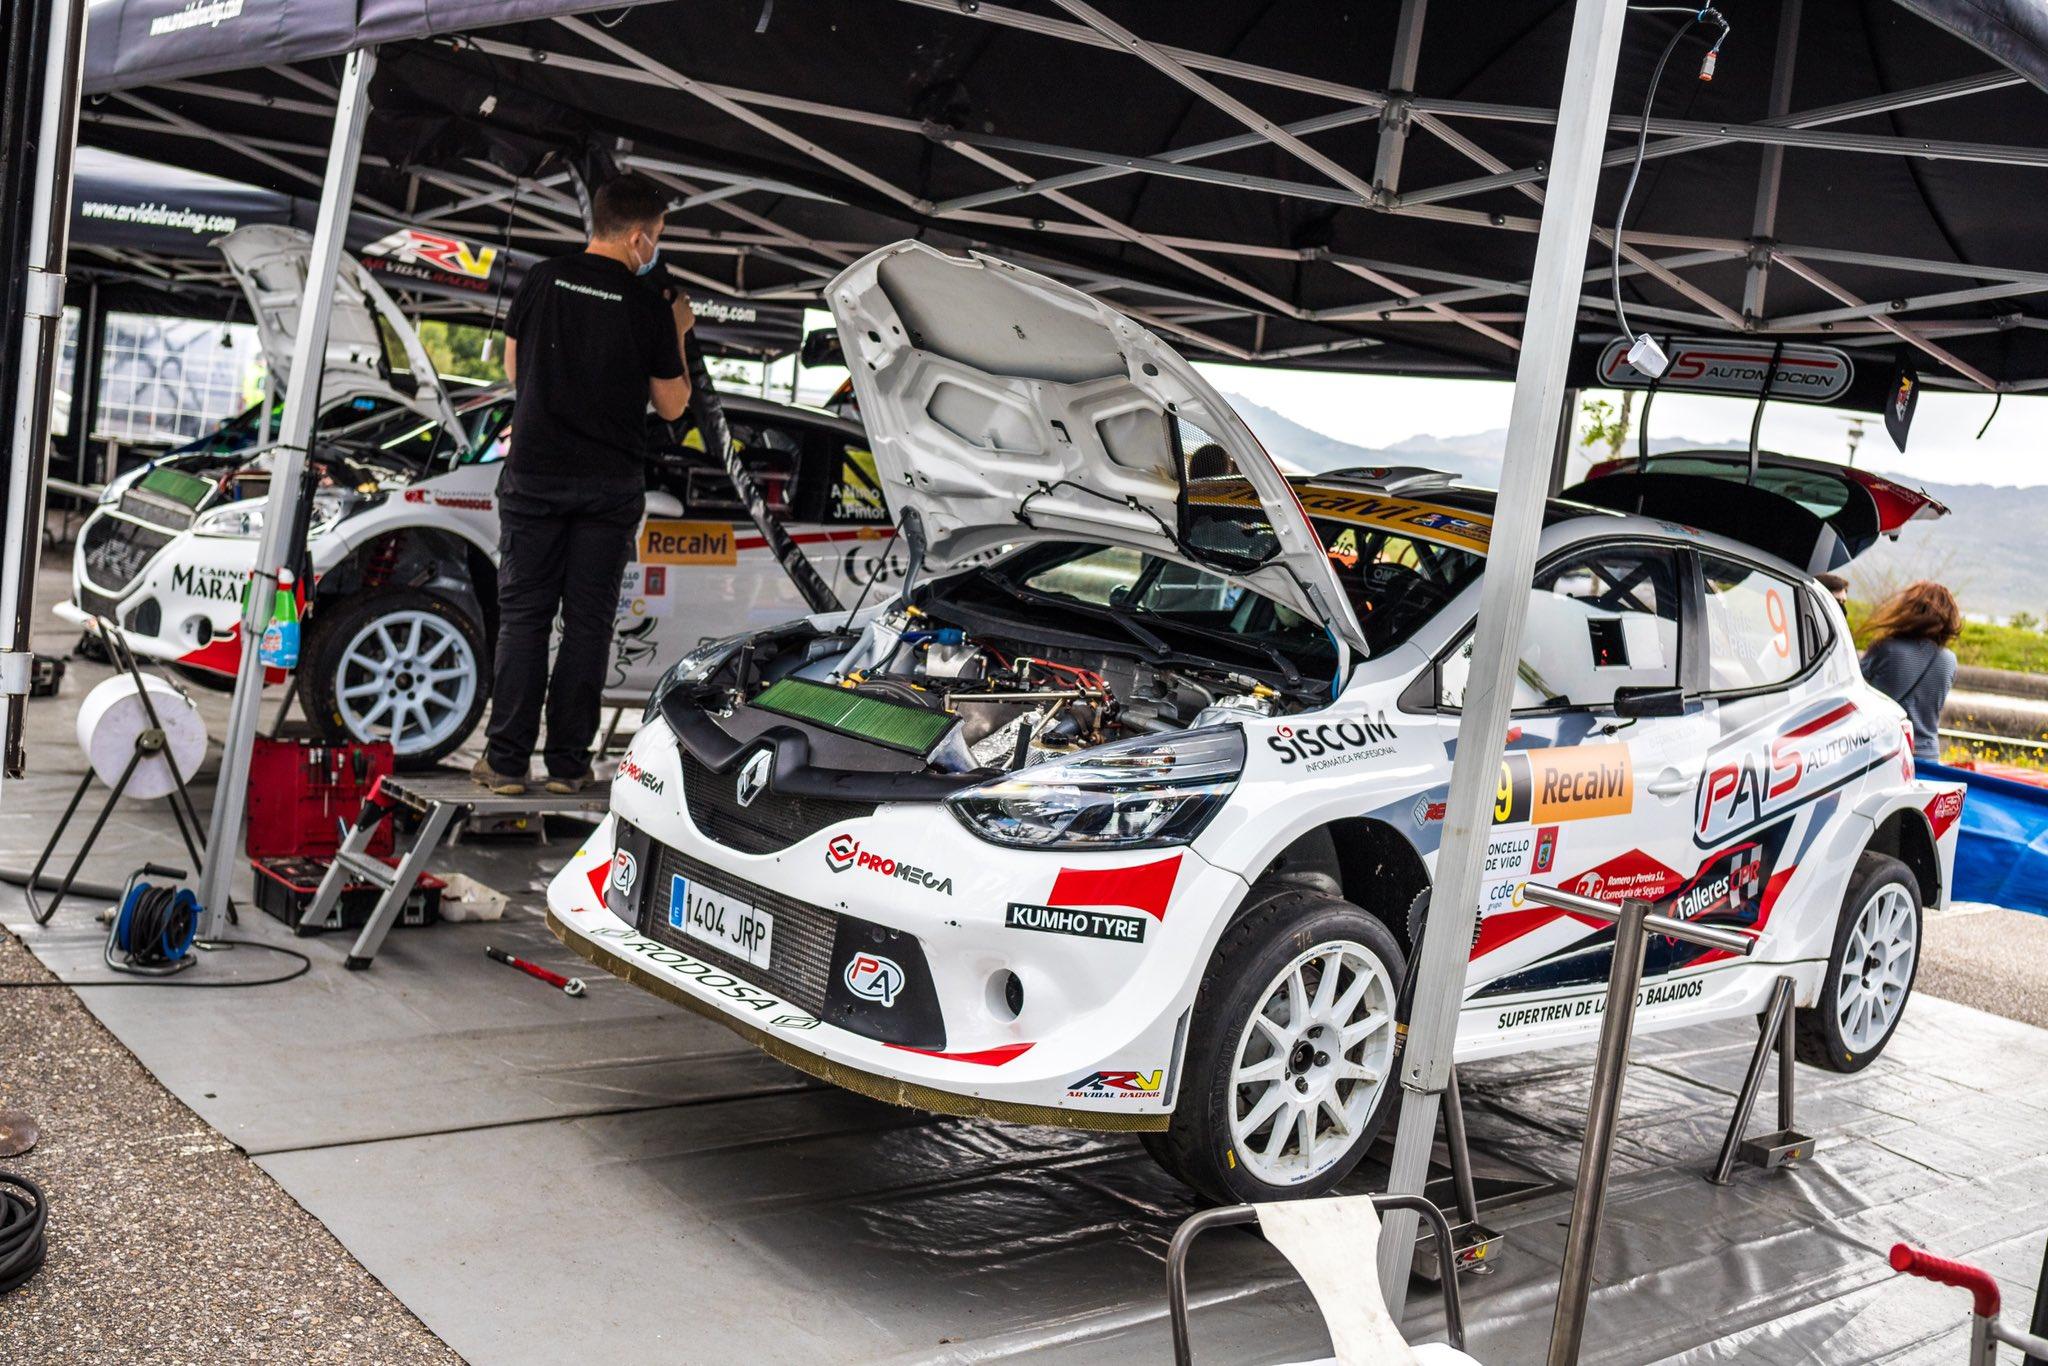 CERA: 54º Rallye Recalvi Rias Baixas [23-25 Julio] E7Af8wtWEAAKTci?format=jpg&name=large